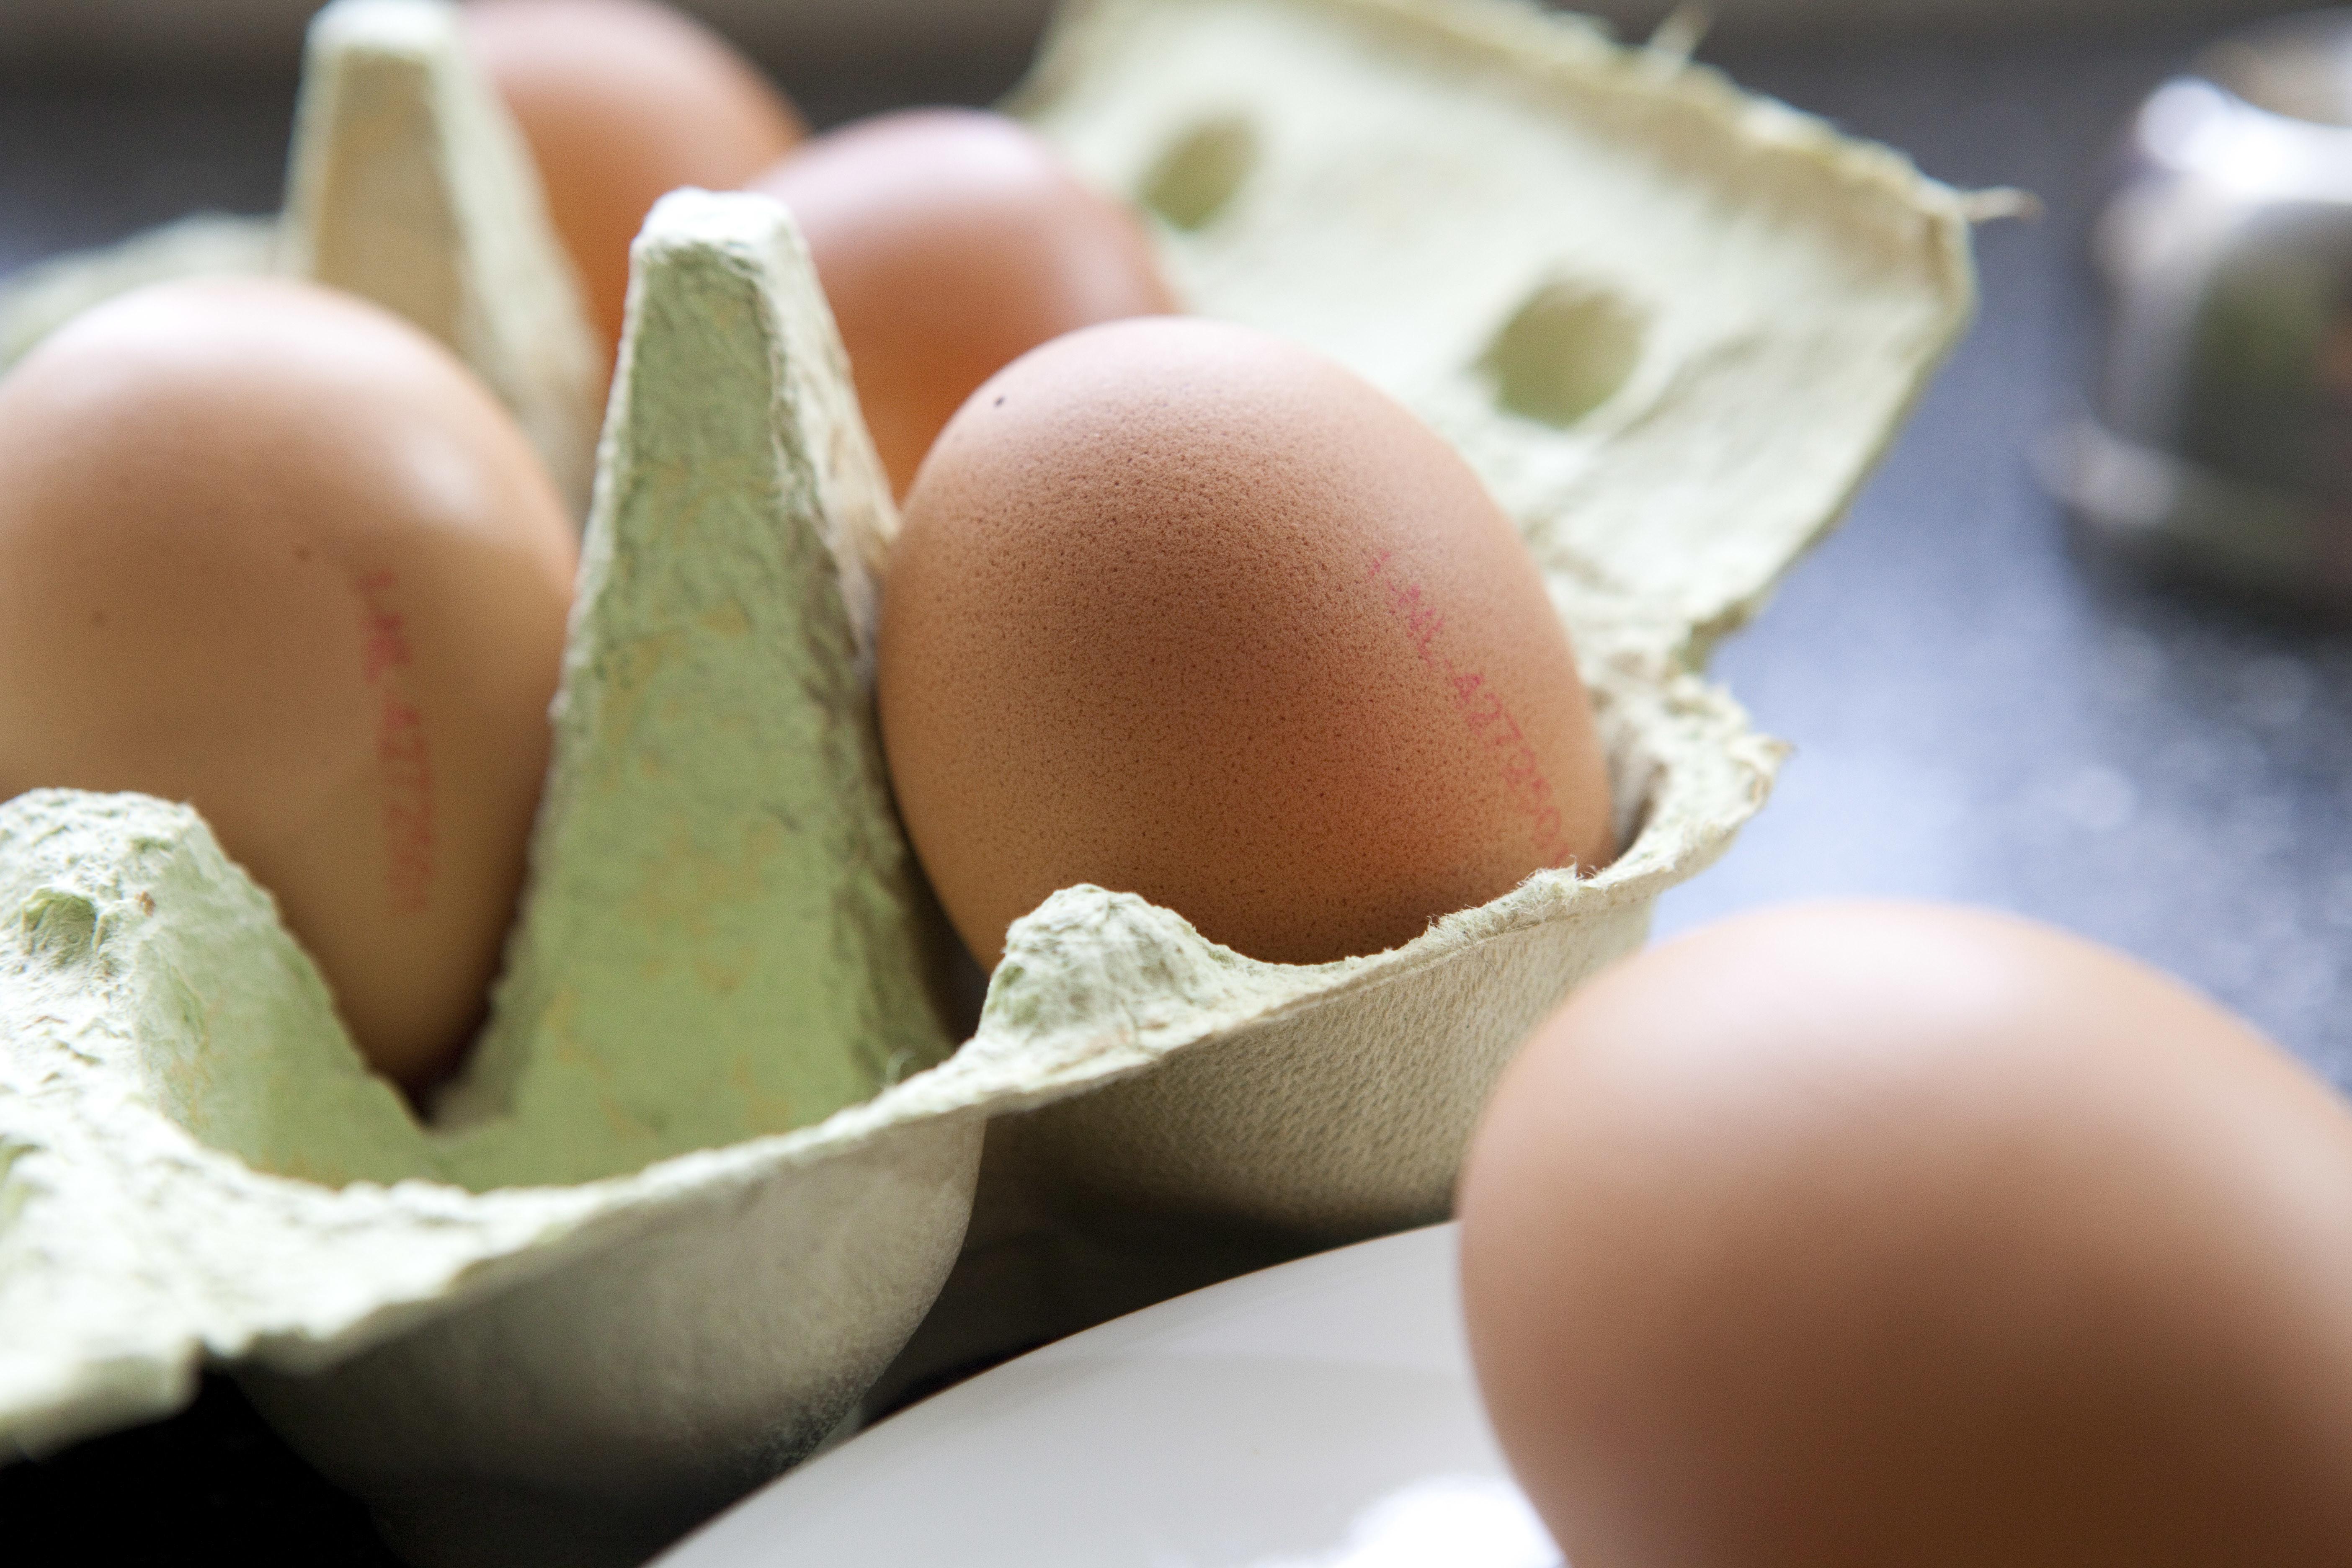 Eggs play key role vitamin D deficiency